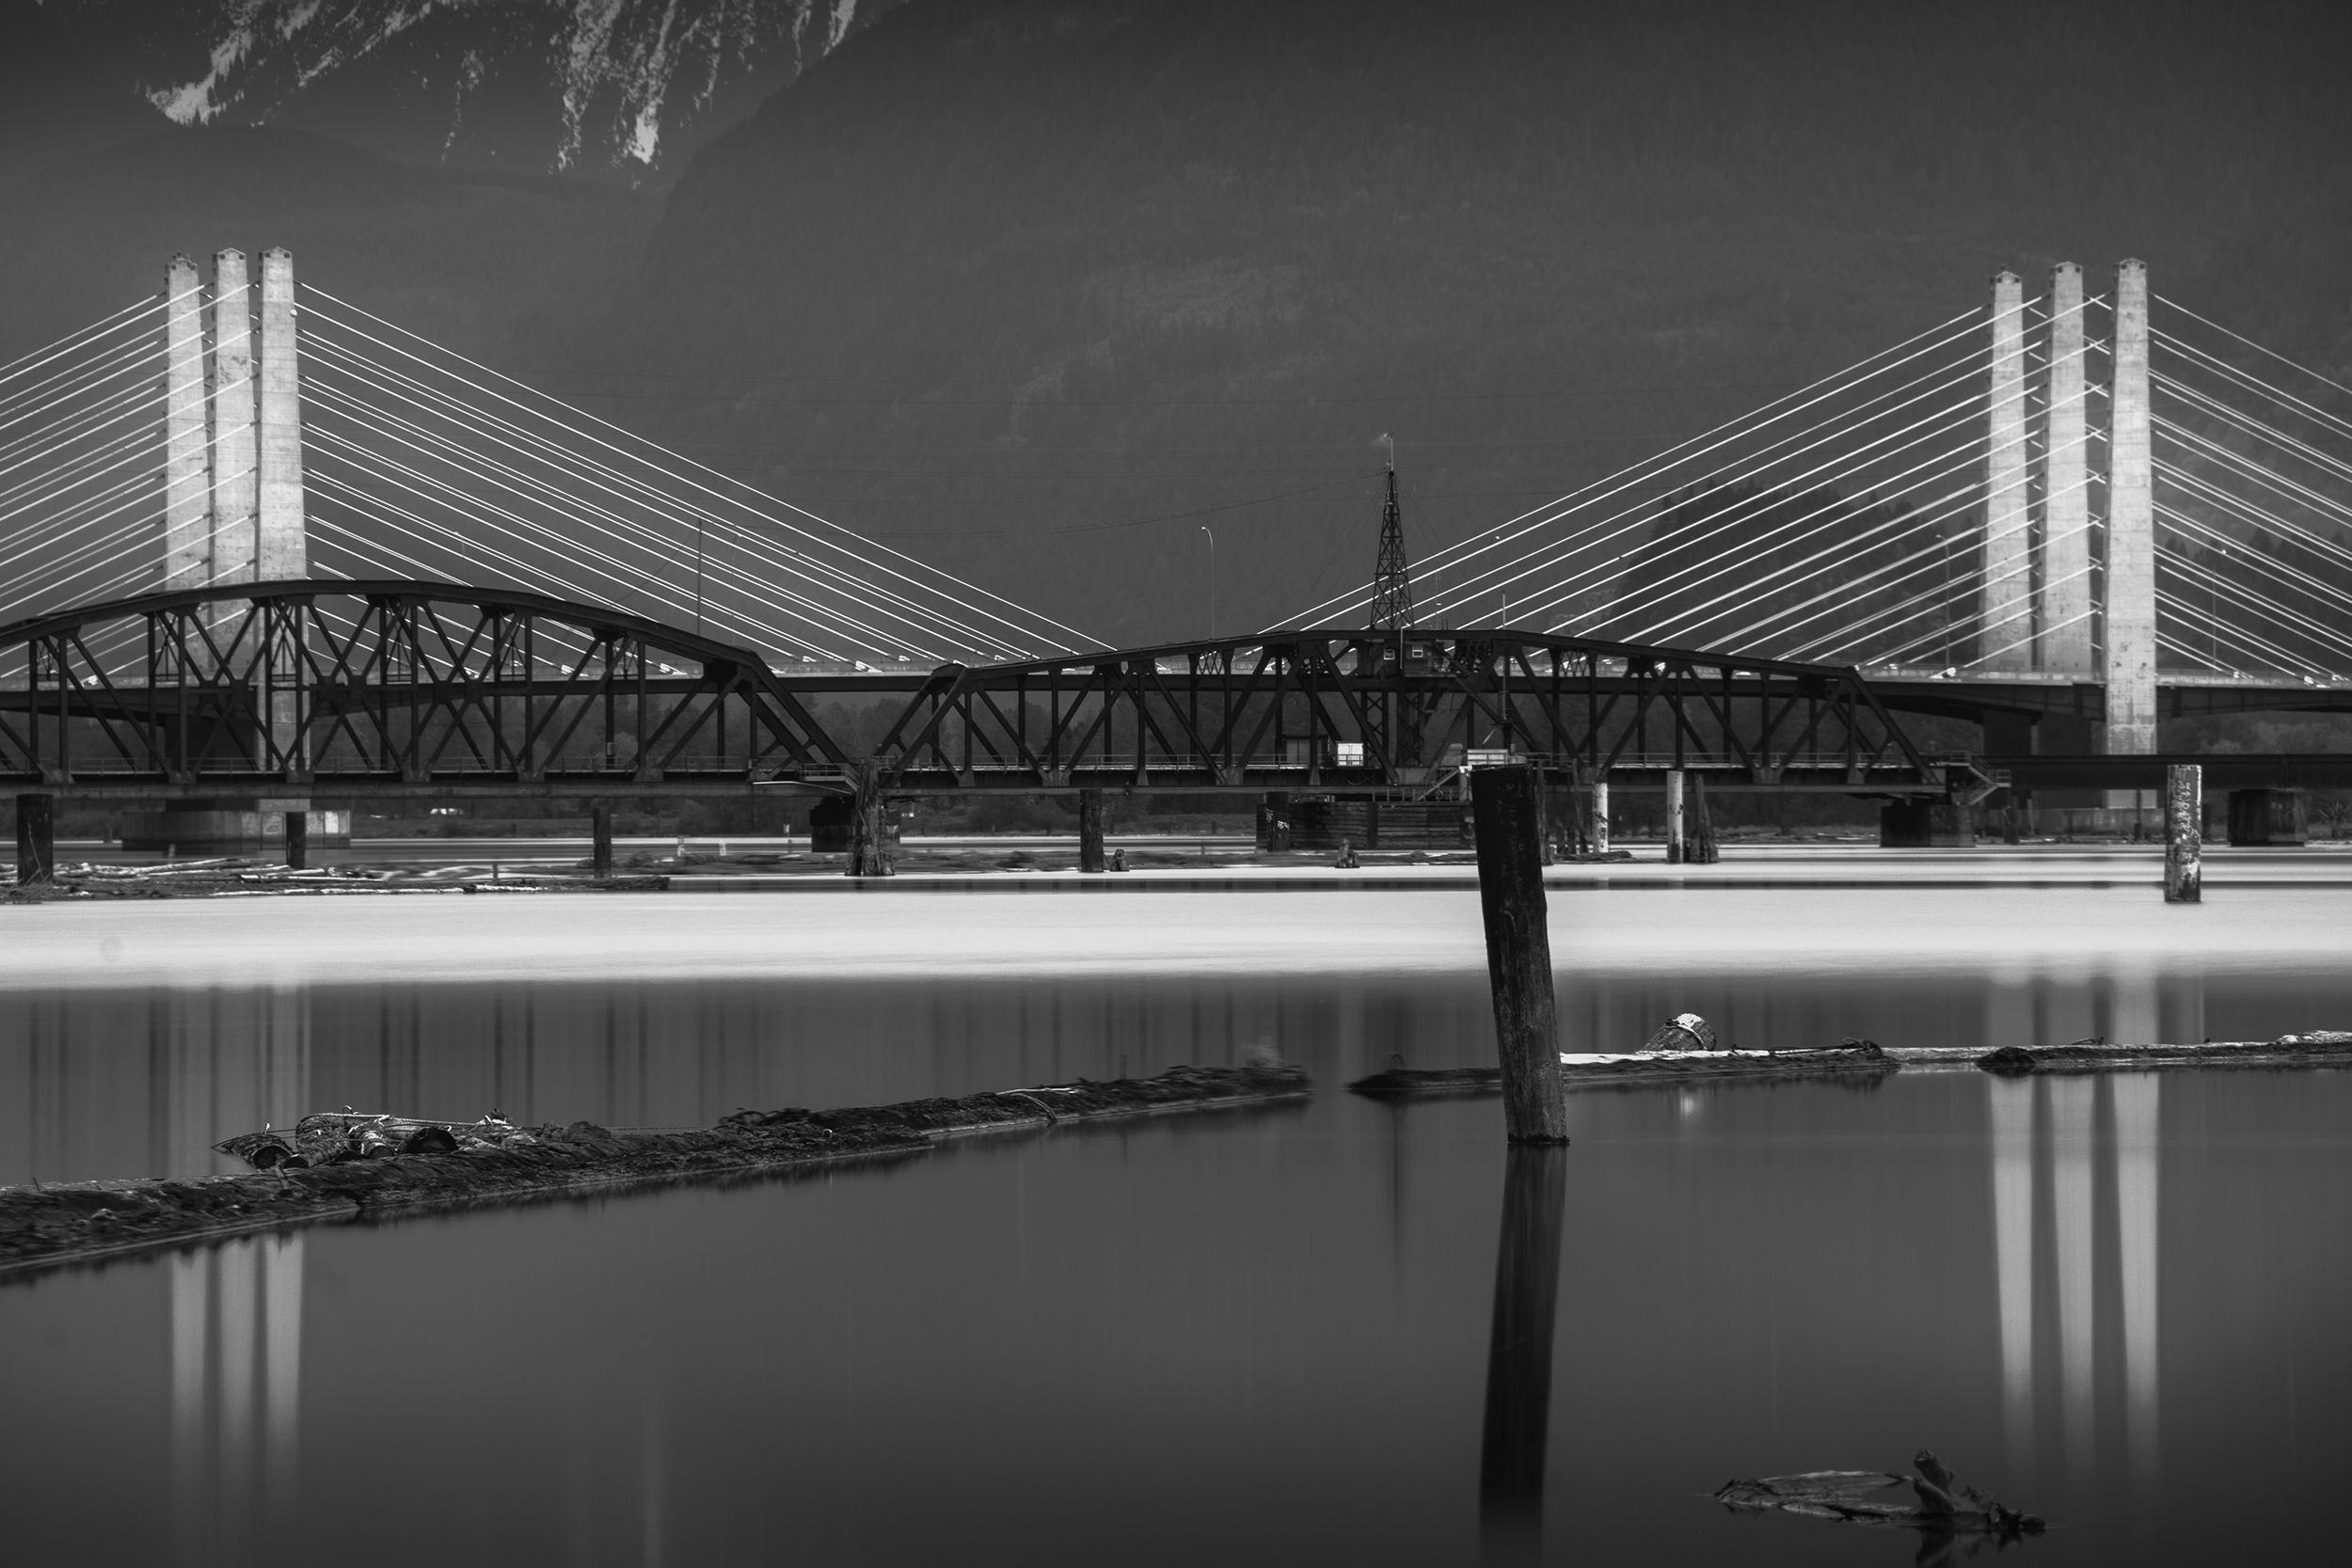 Bridges of the Pitt River